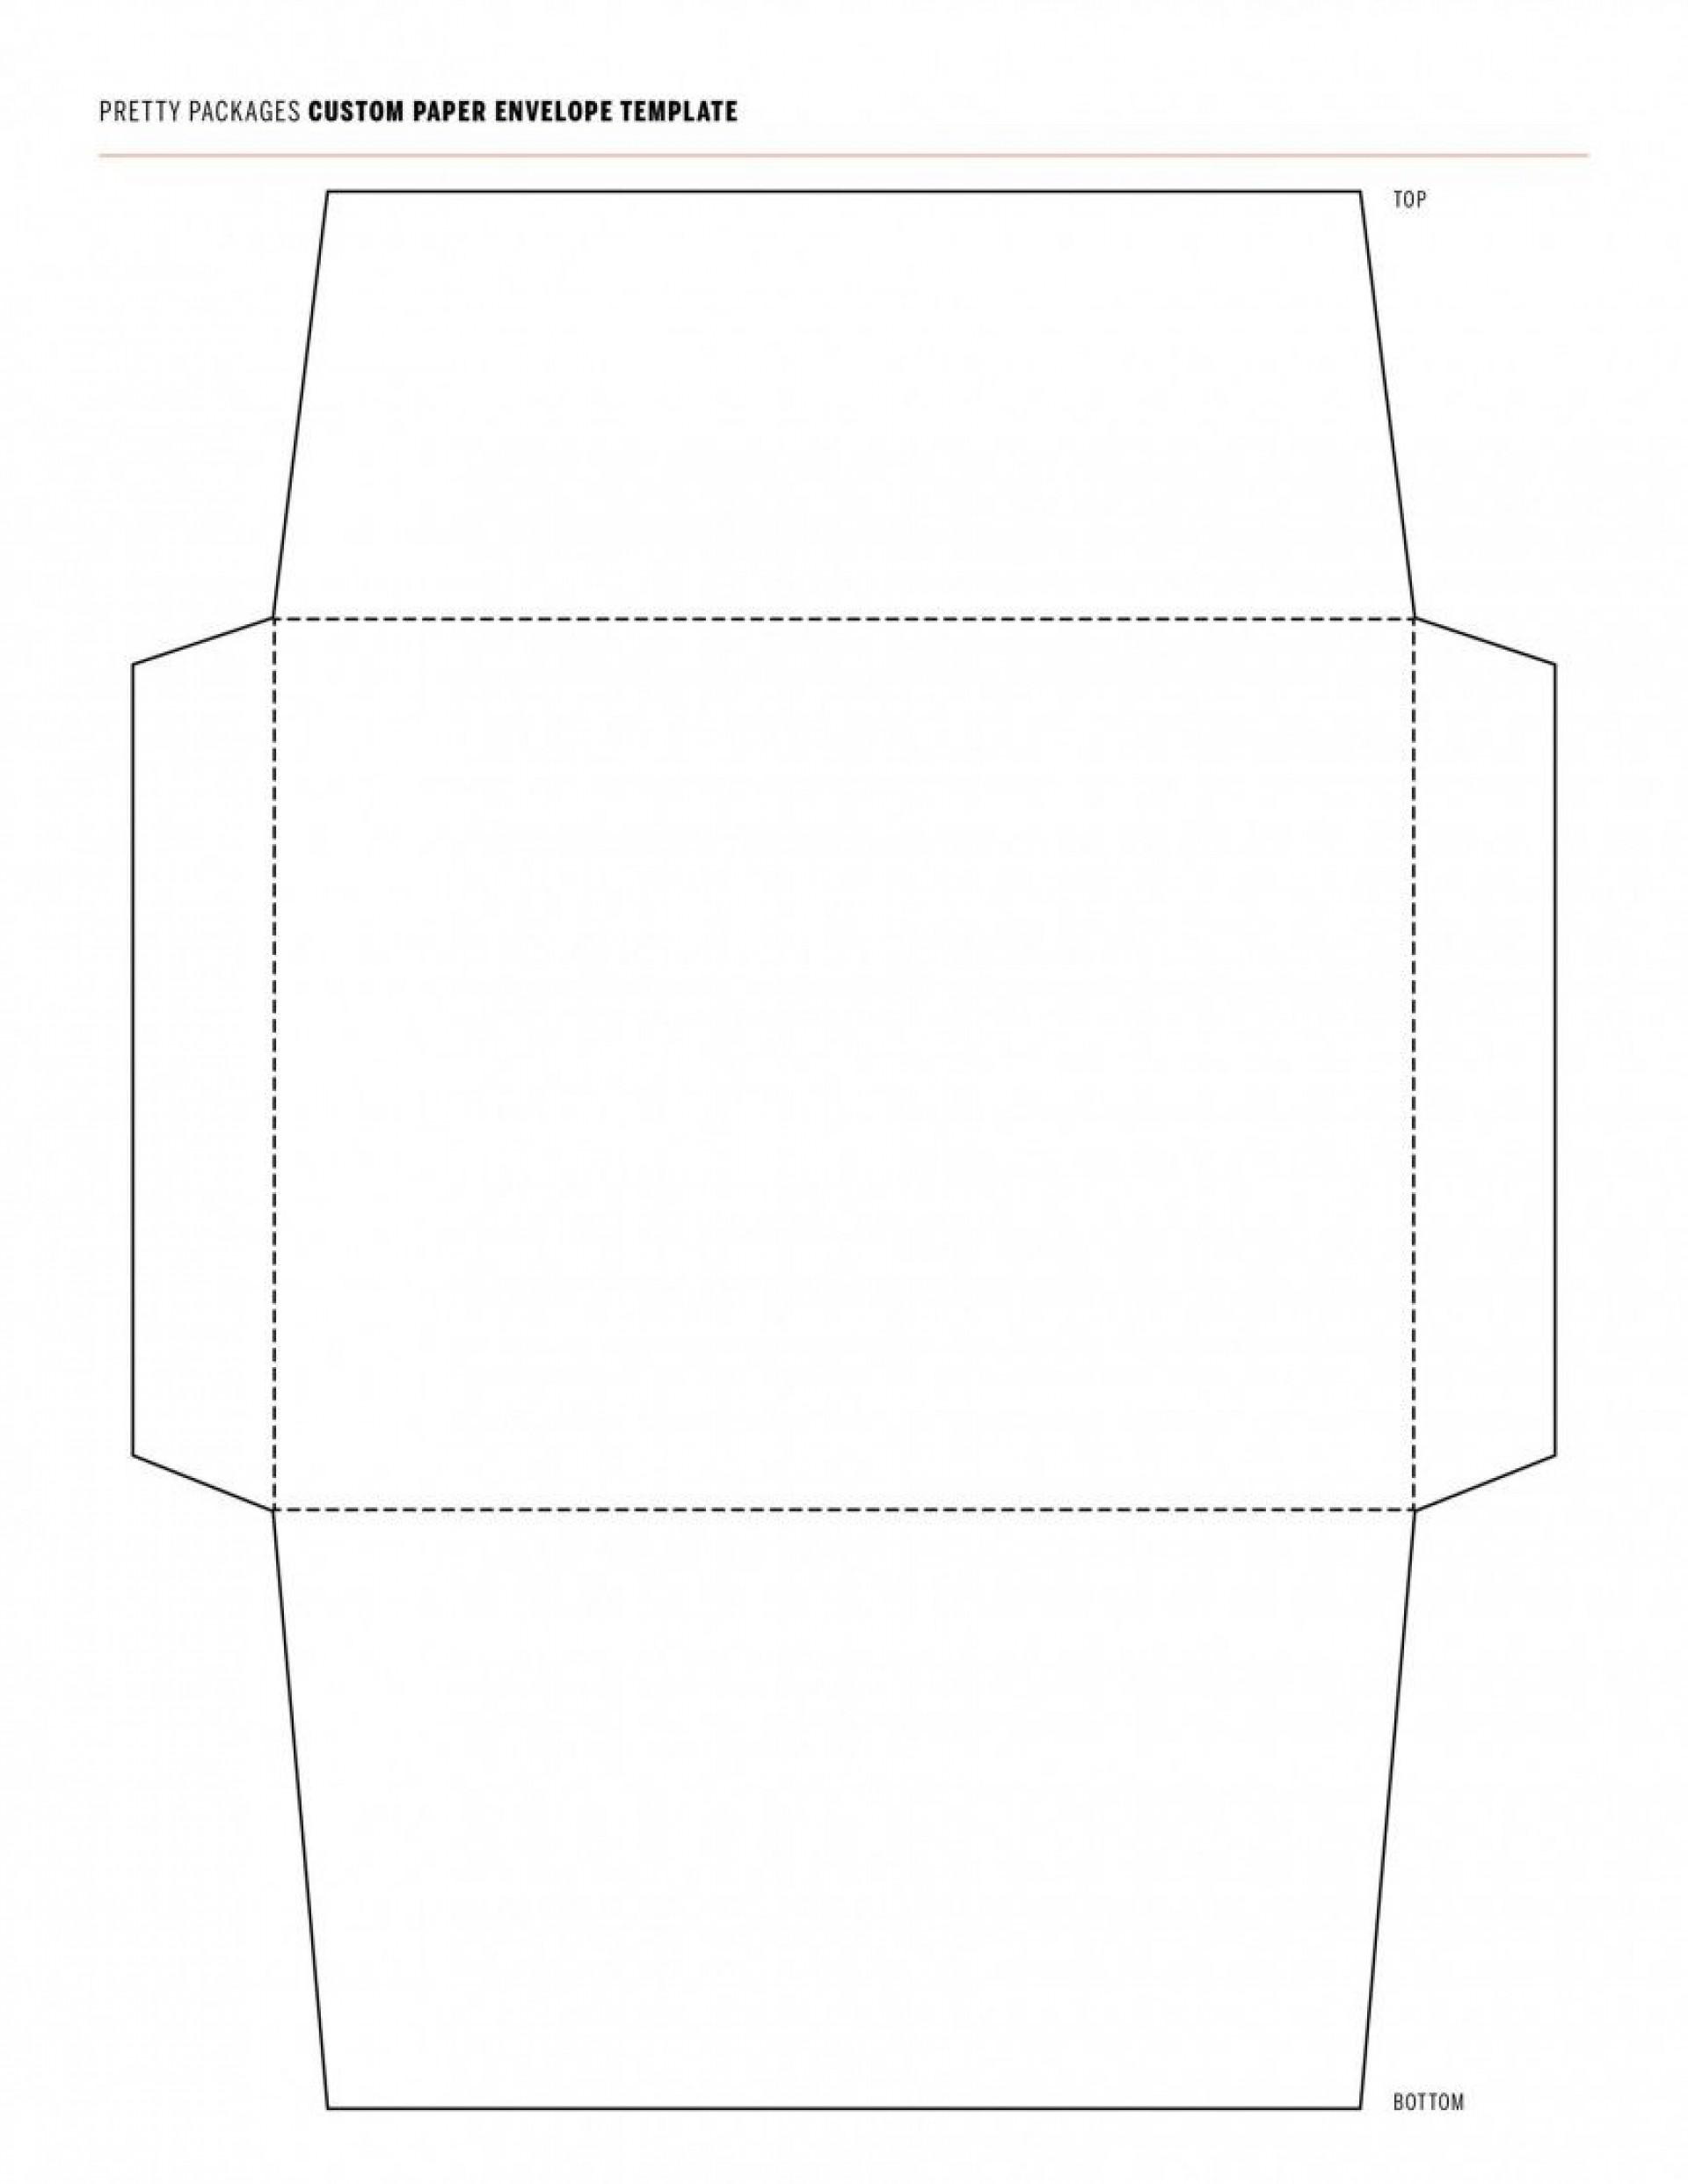 000 Surprising 10 Envelope Template Word Concept  Size Microsoft #10 Double Window1920